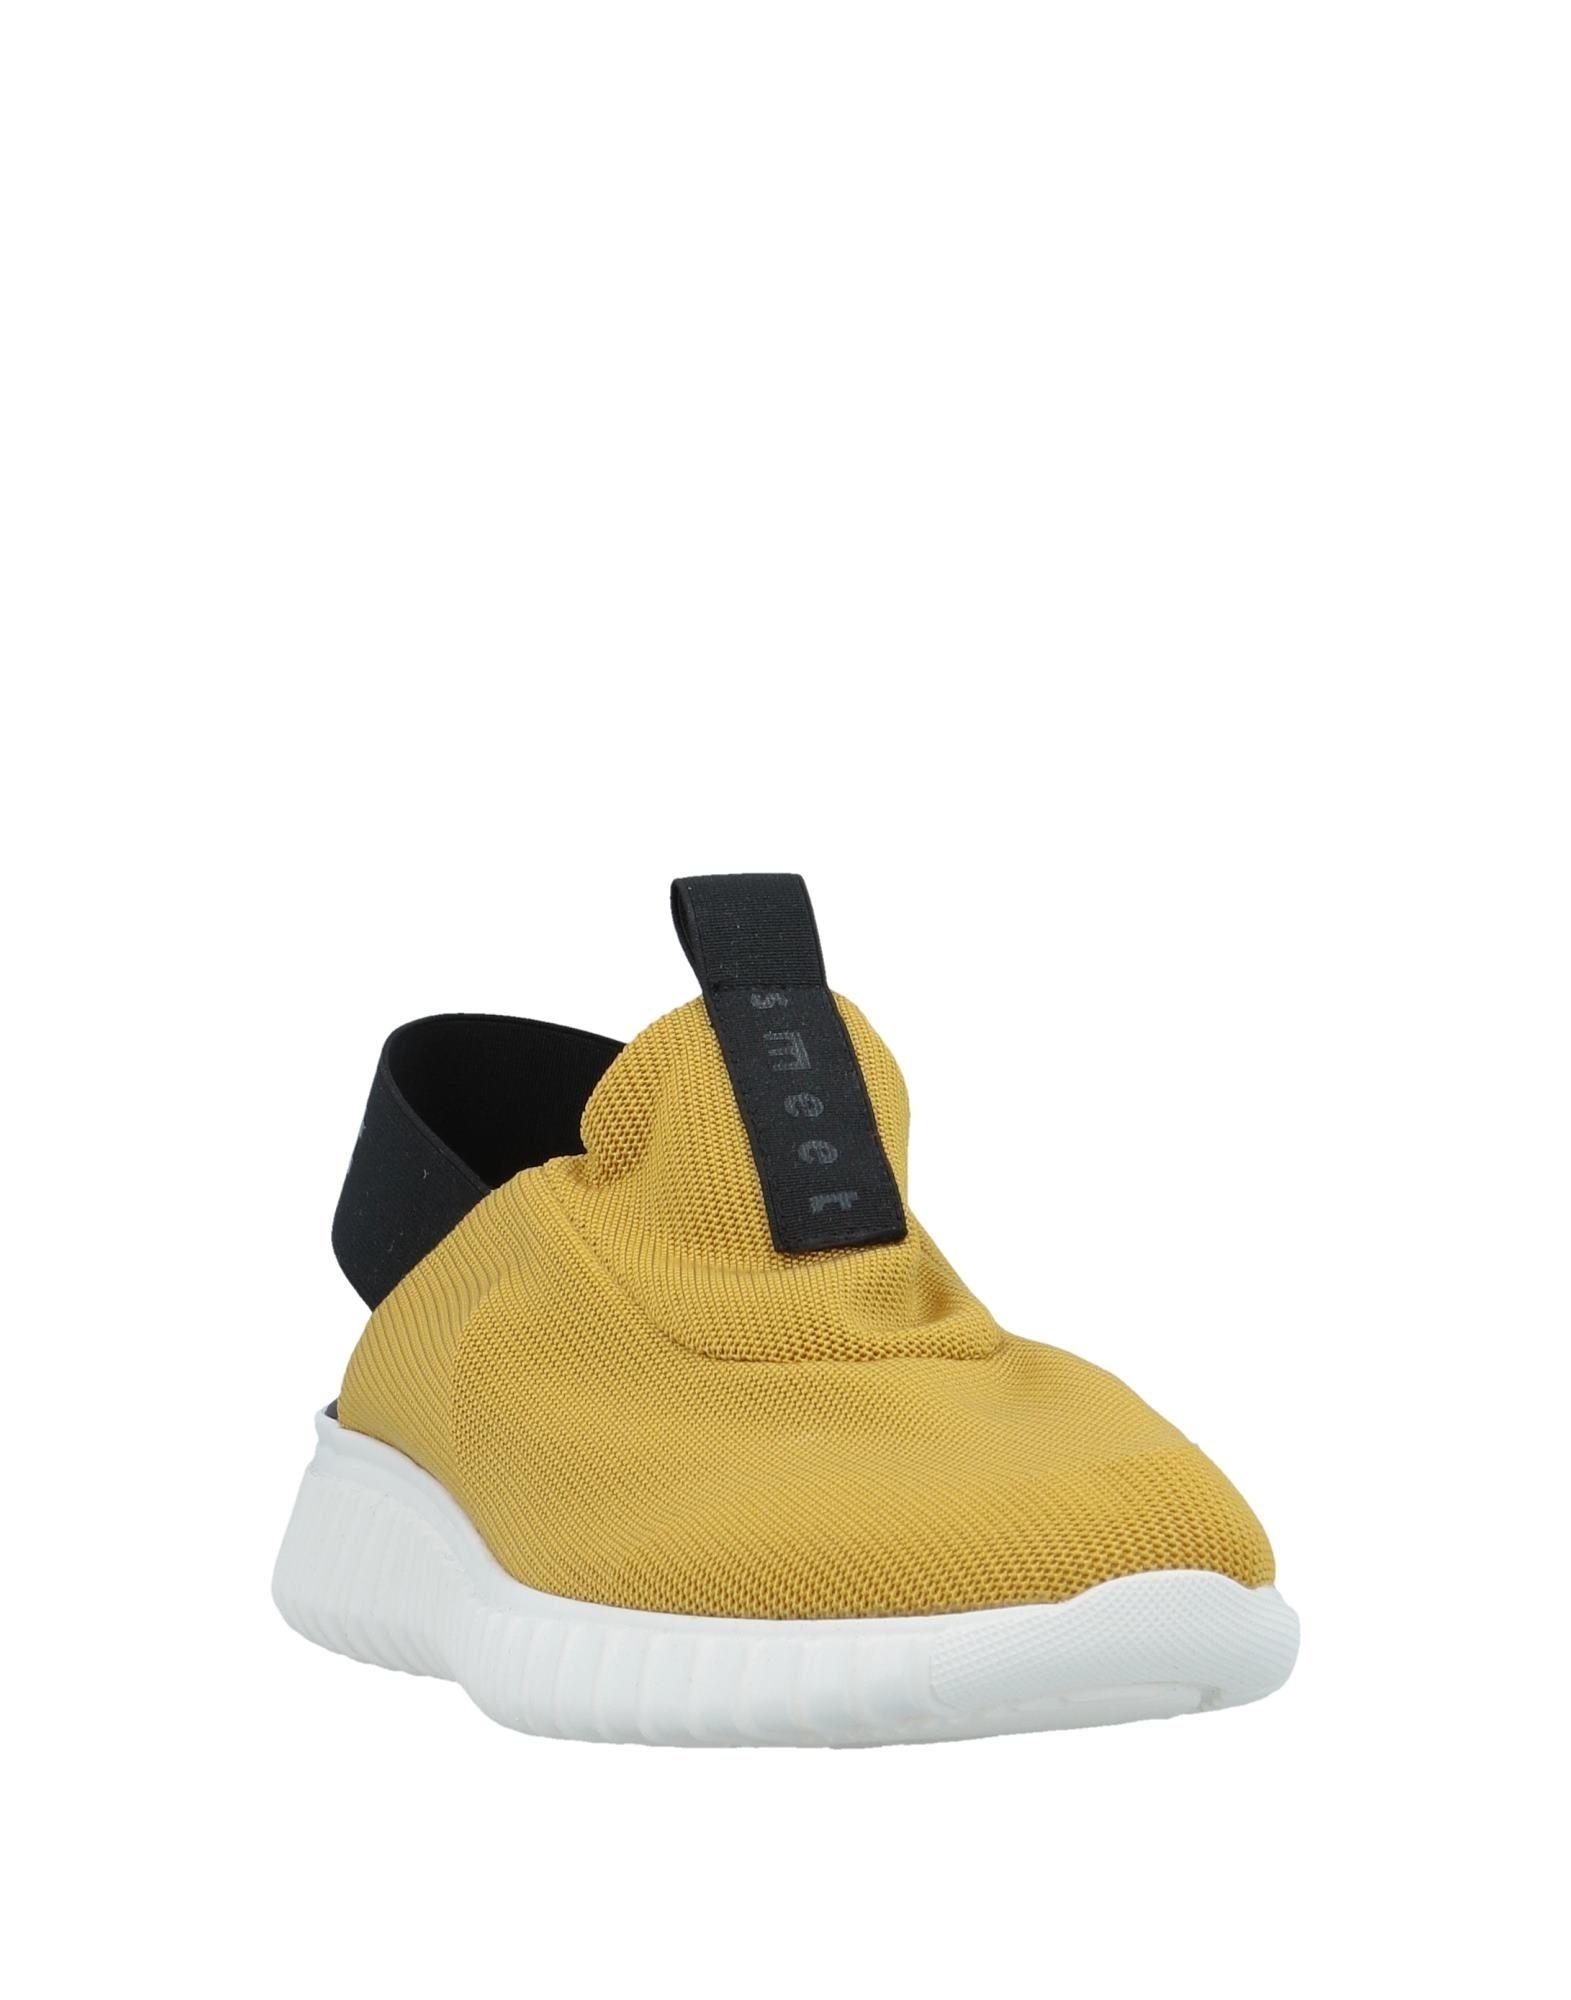 Stilvolle Damen billige Schuhe Smeet Sneakers Damen Stilvolle  11580746AP e67947